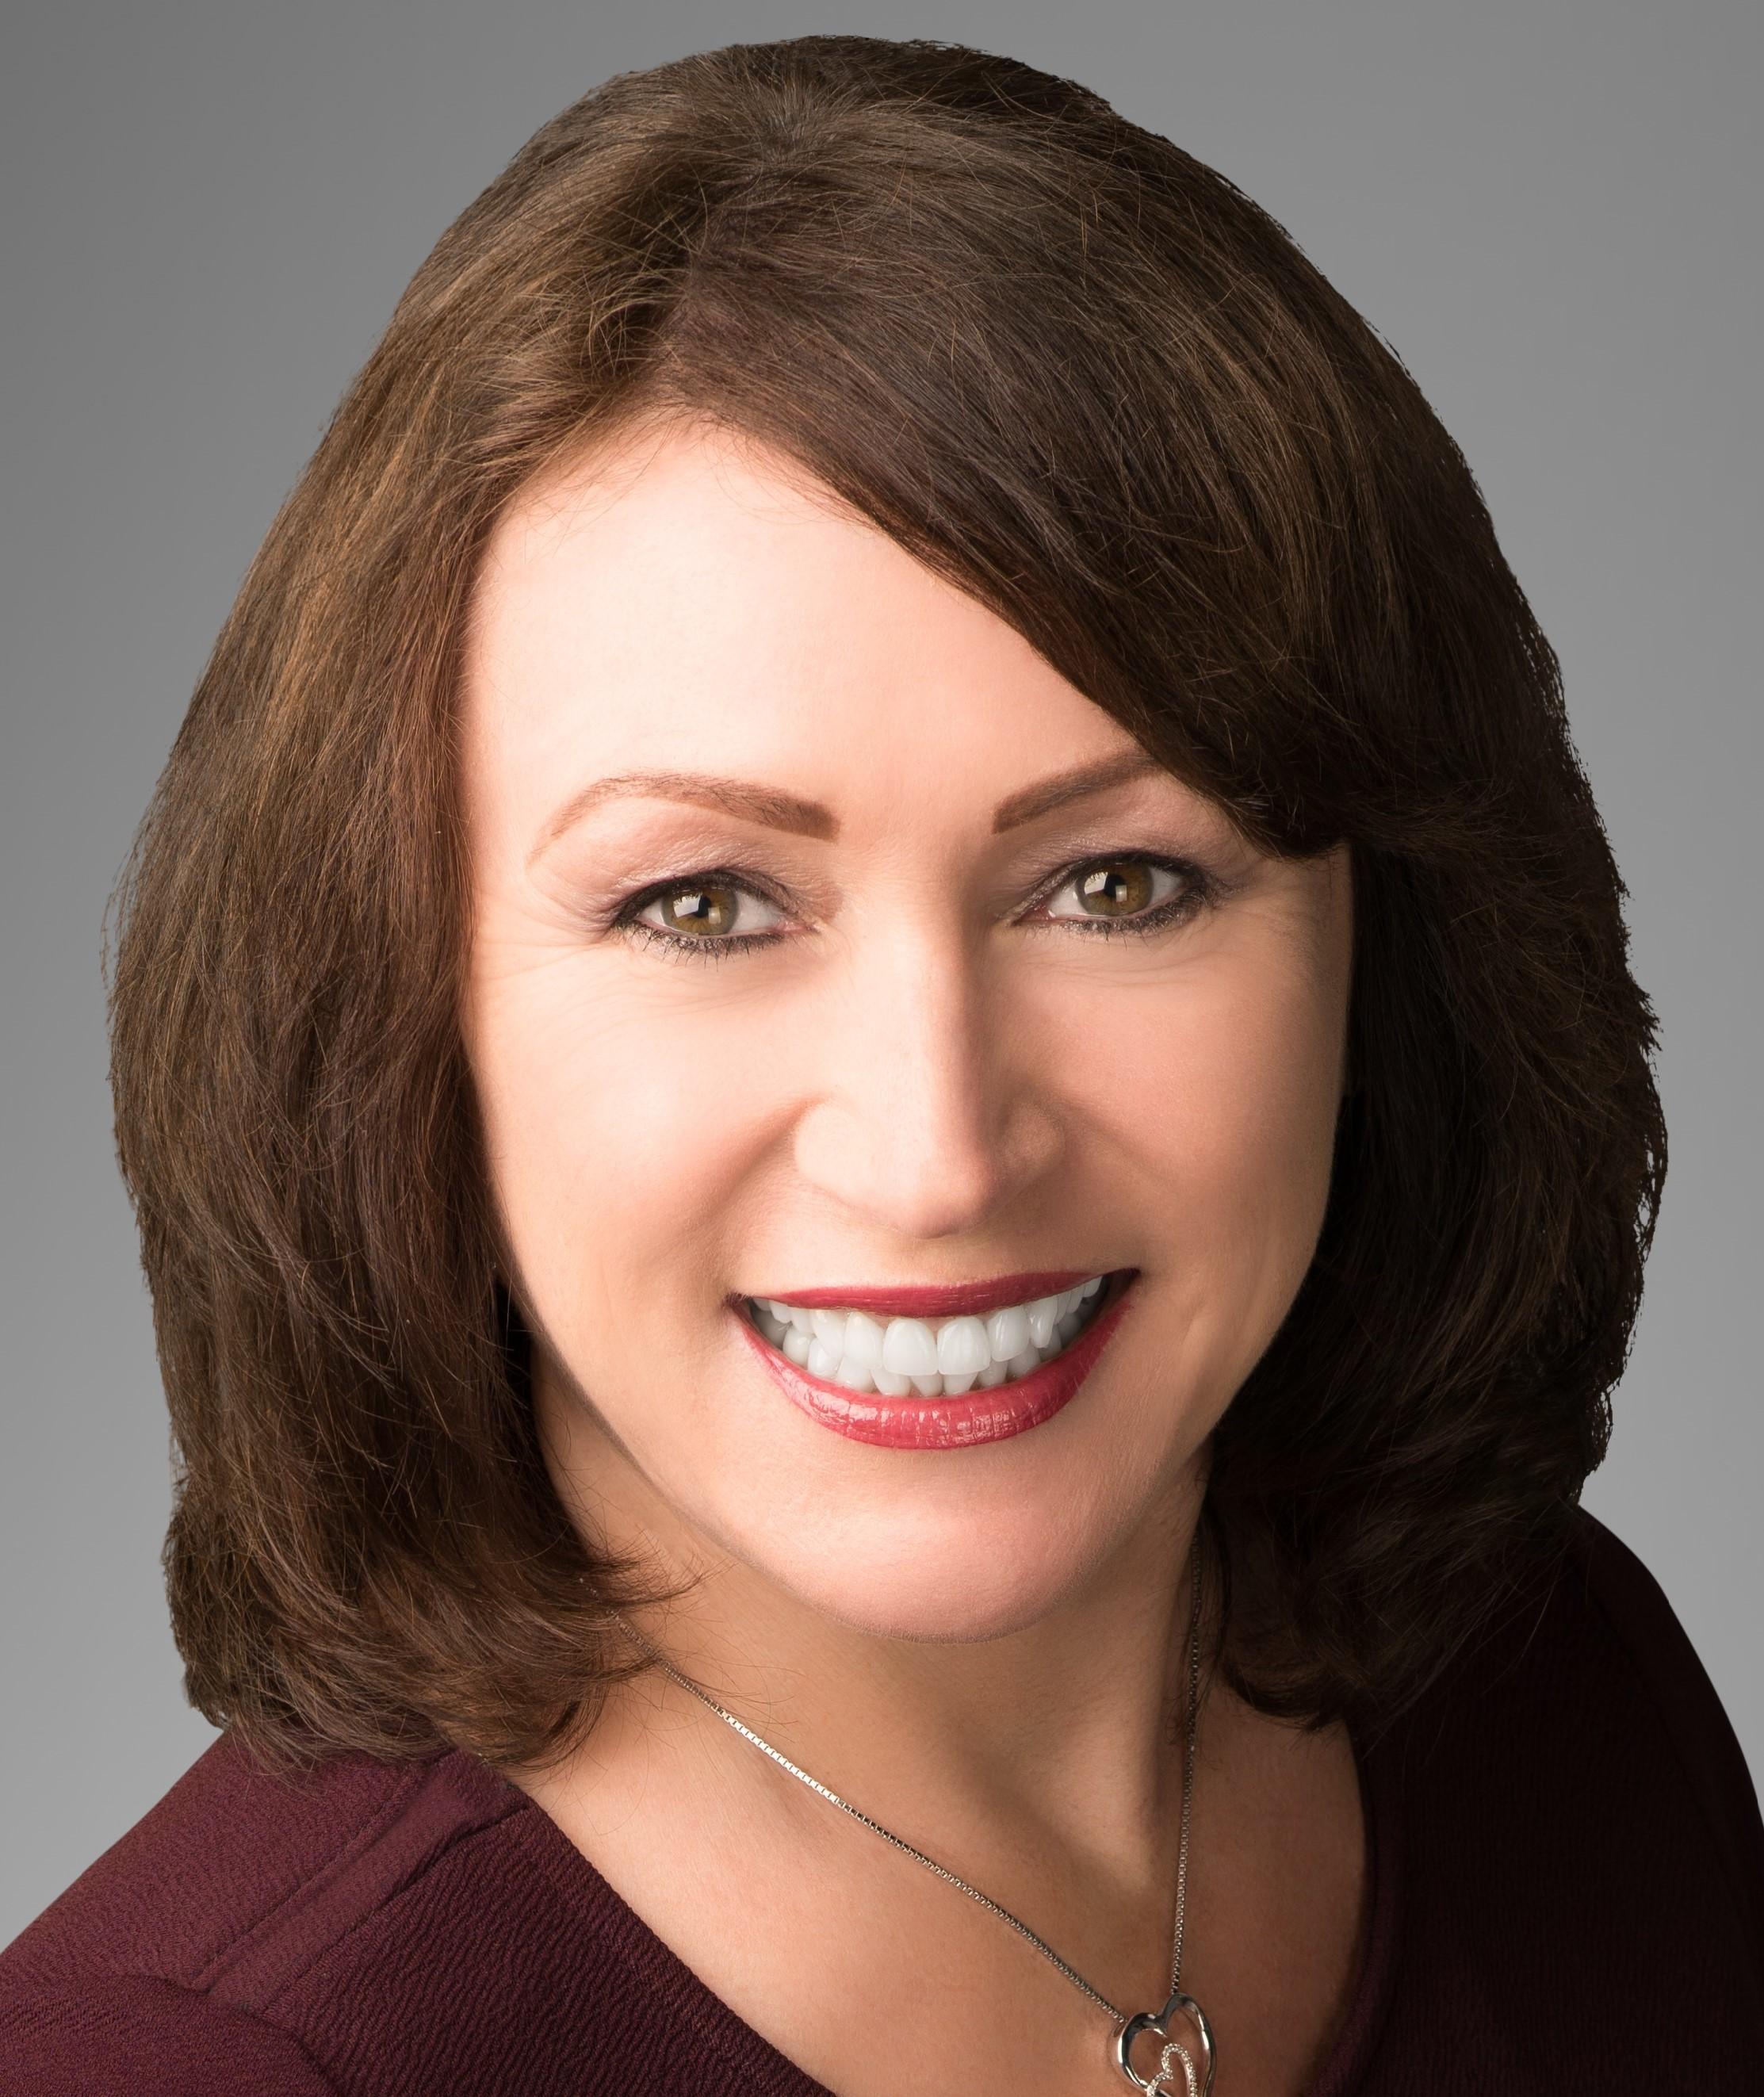 Darlene Stinson